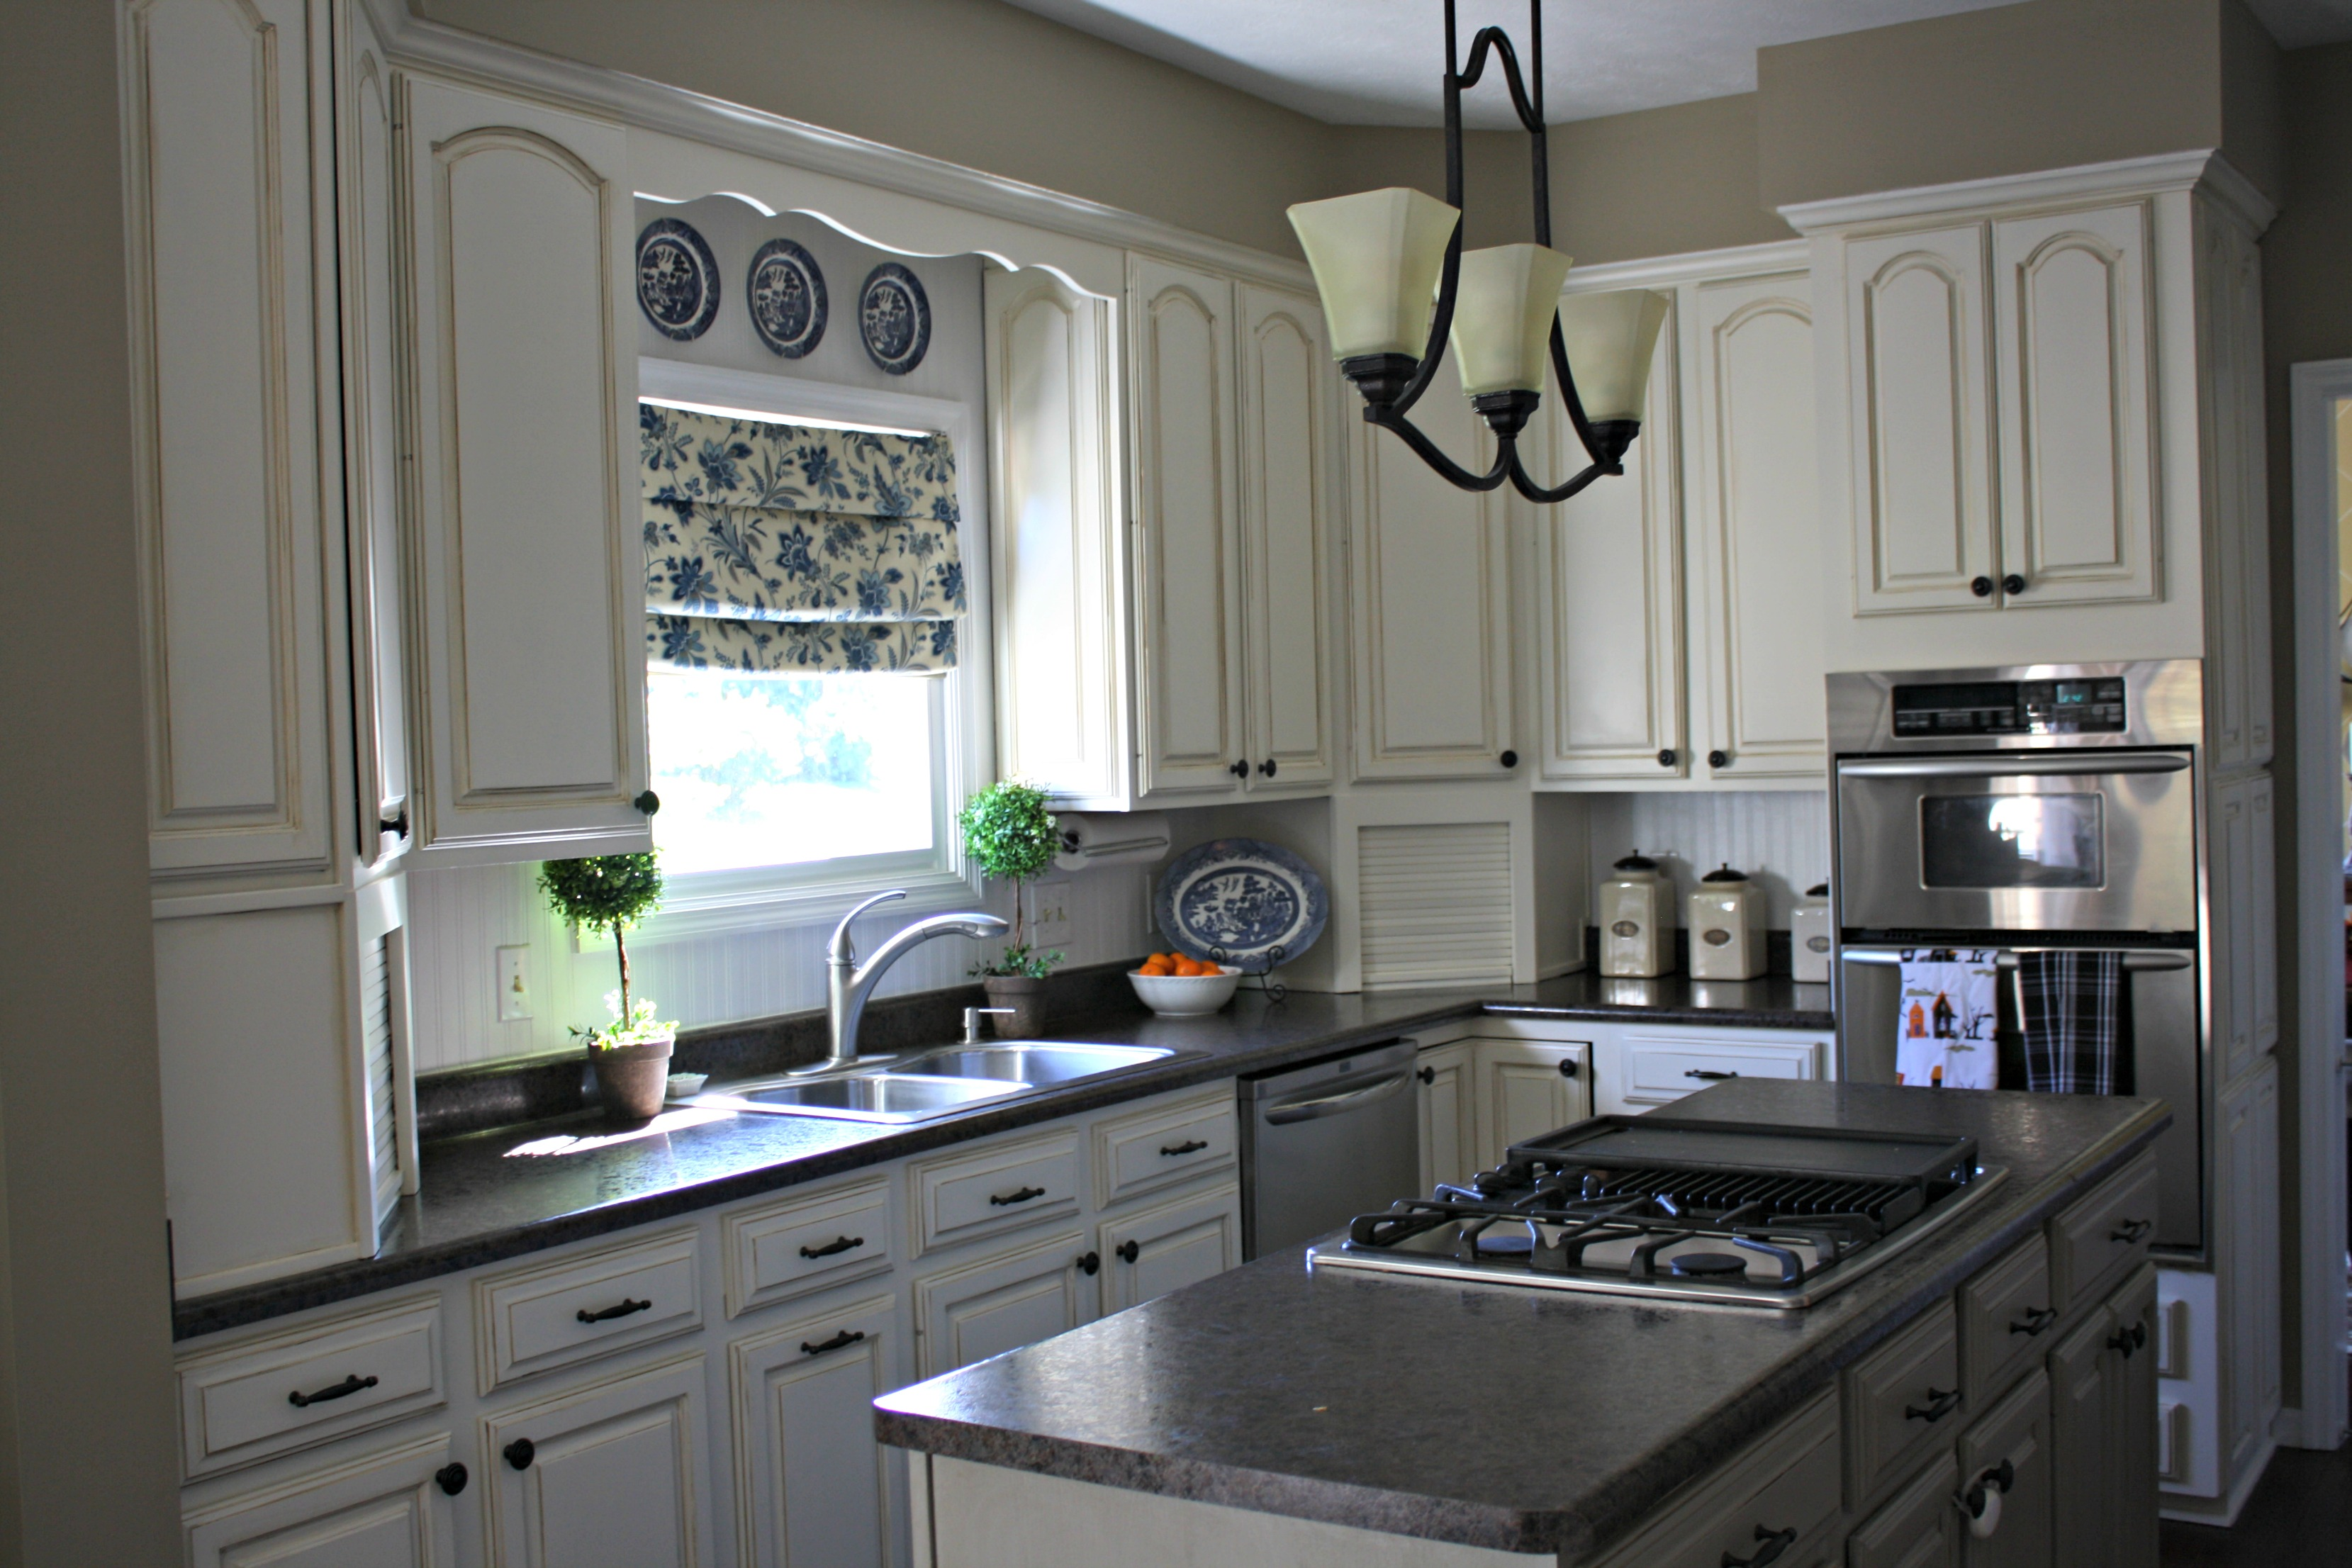 Pic Kitchen after - Amanda's Amazing Kitchen Upgrade